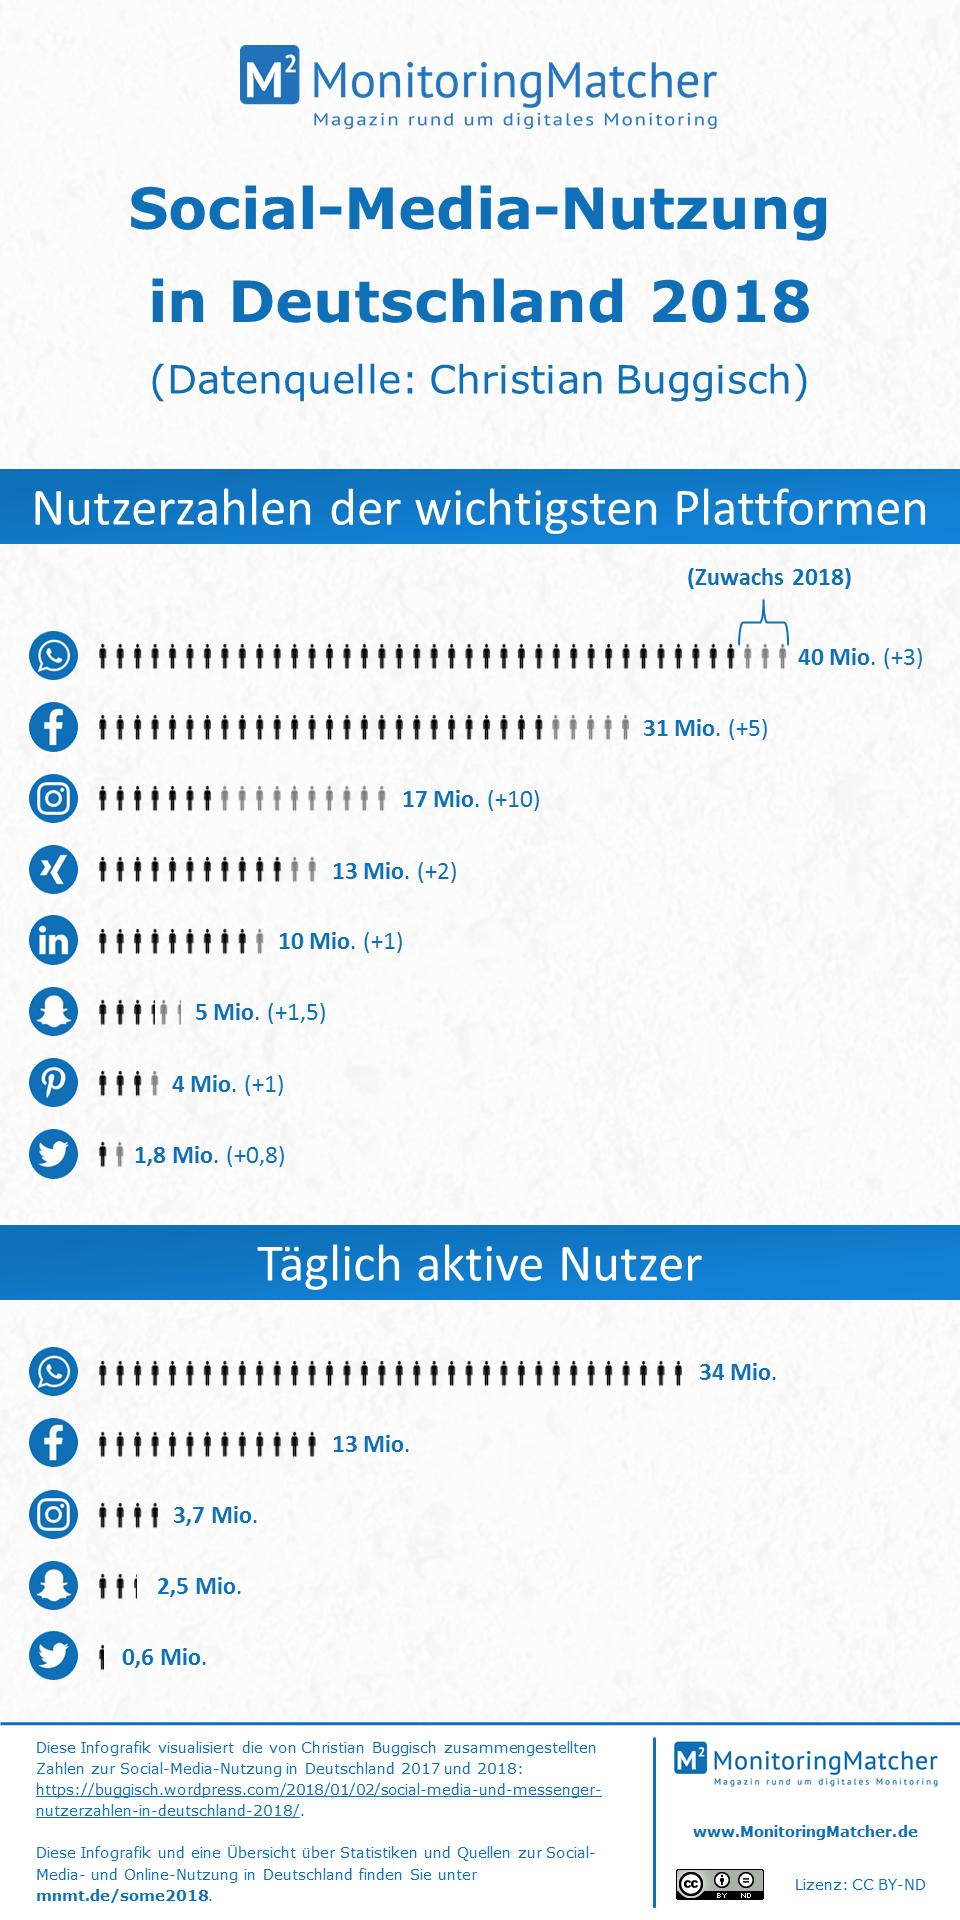 Social-Media-Nutzung in Deutschland 2018 (Infografik)